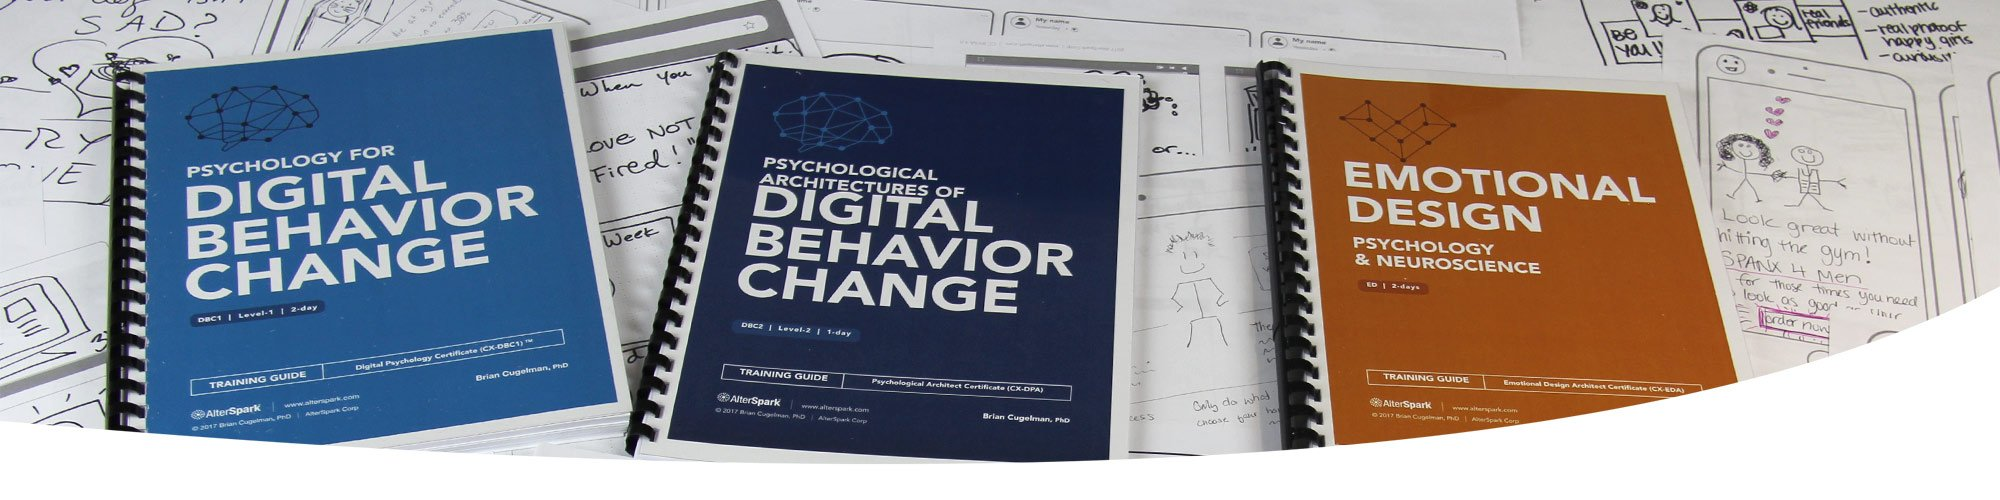 Digital Psychology Training For Ux Web Design Marketing Digital